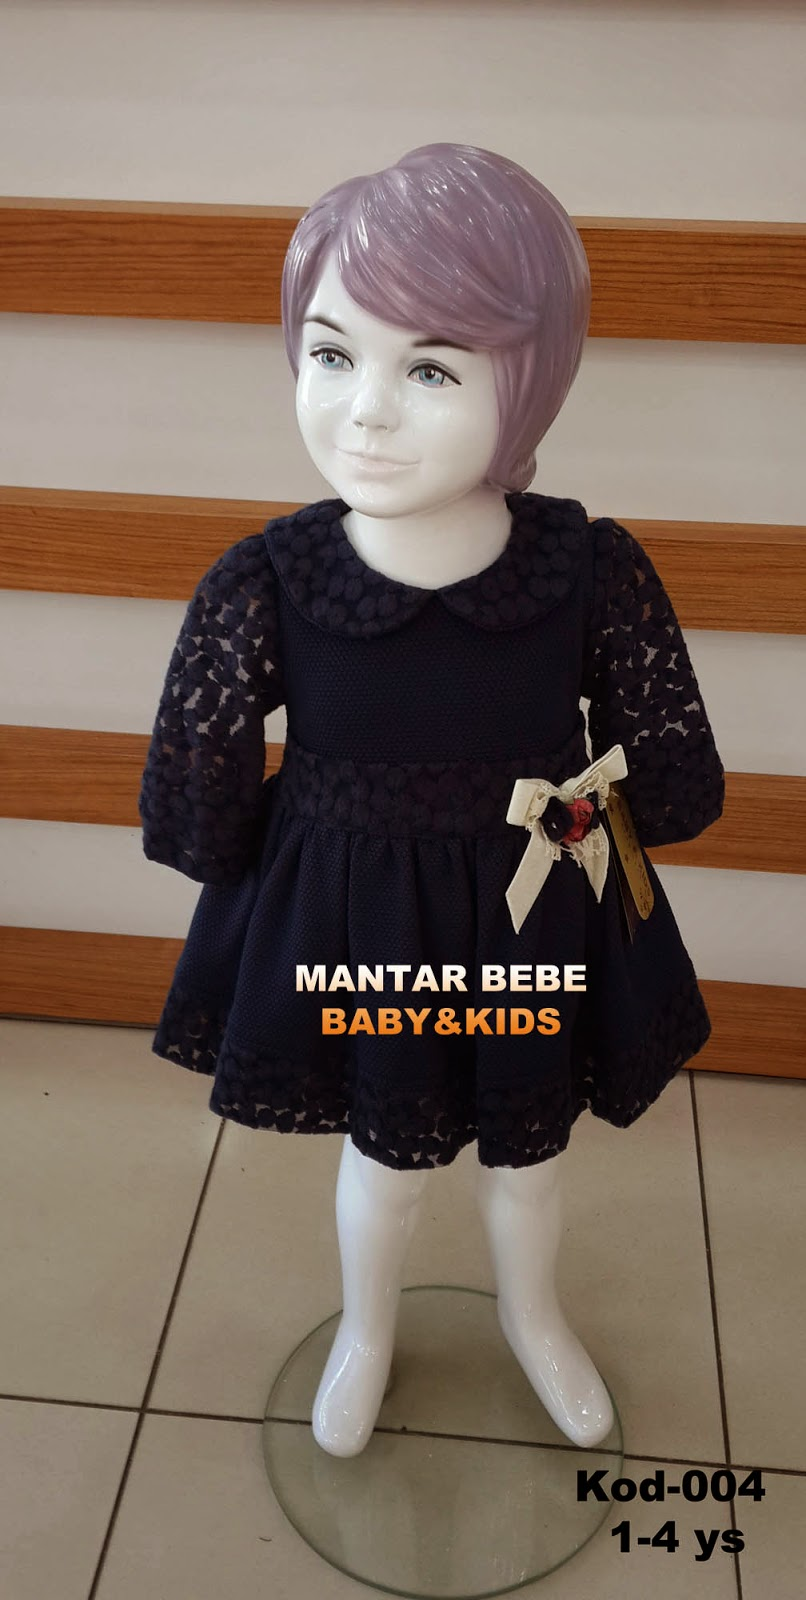 MANTAR BEBE ÇOCUK GİYİM - KOD004